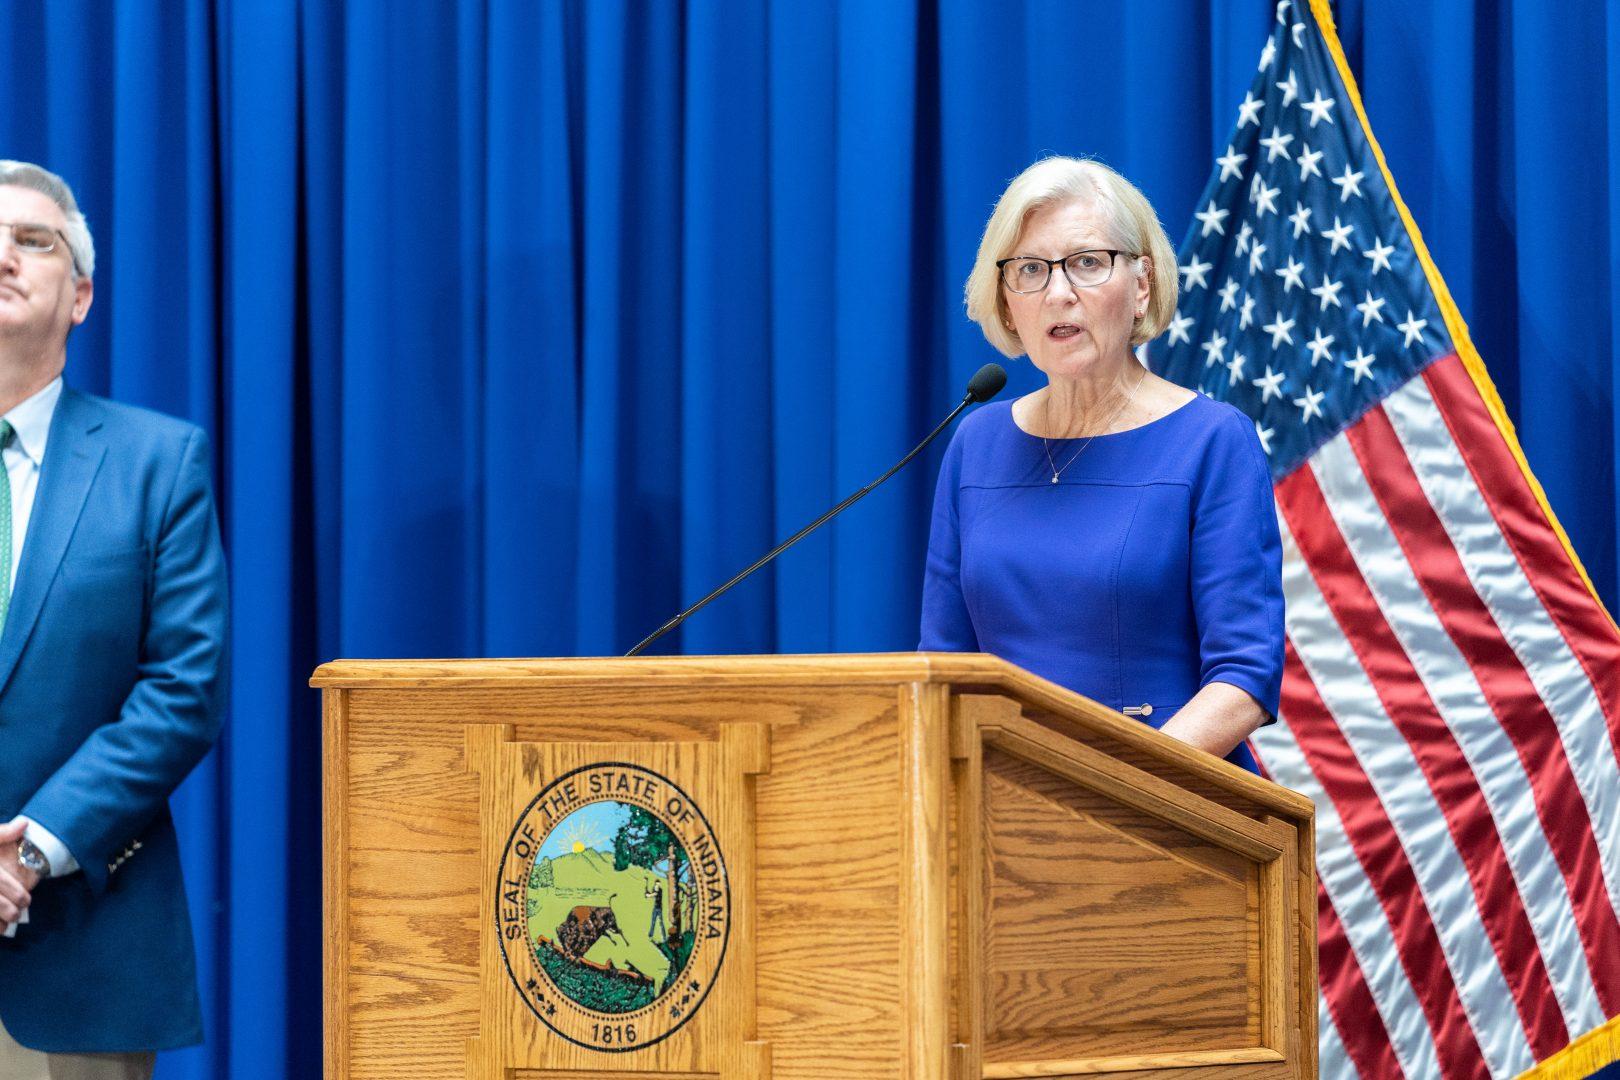 Indiana State Health Commissioner Kristina Box speaks to the media.